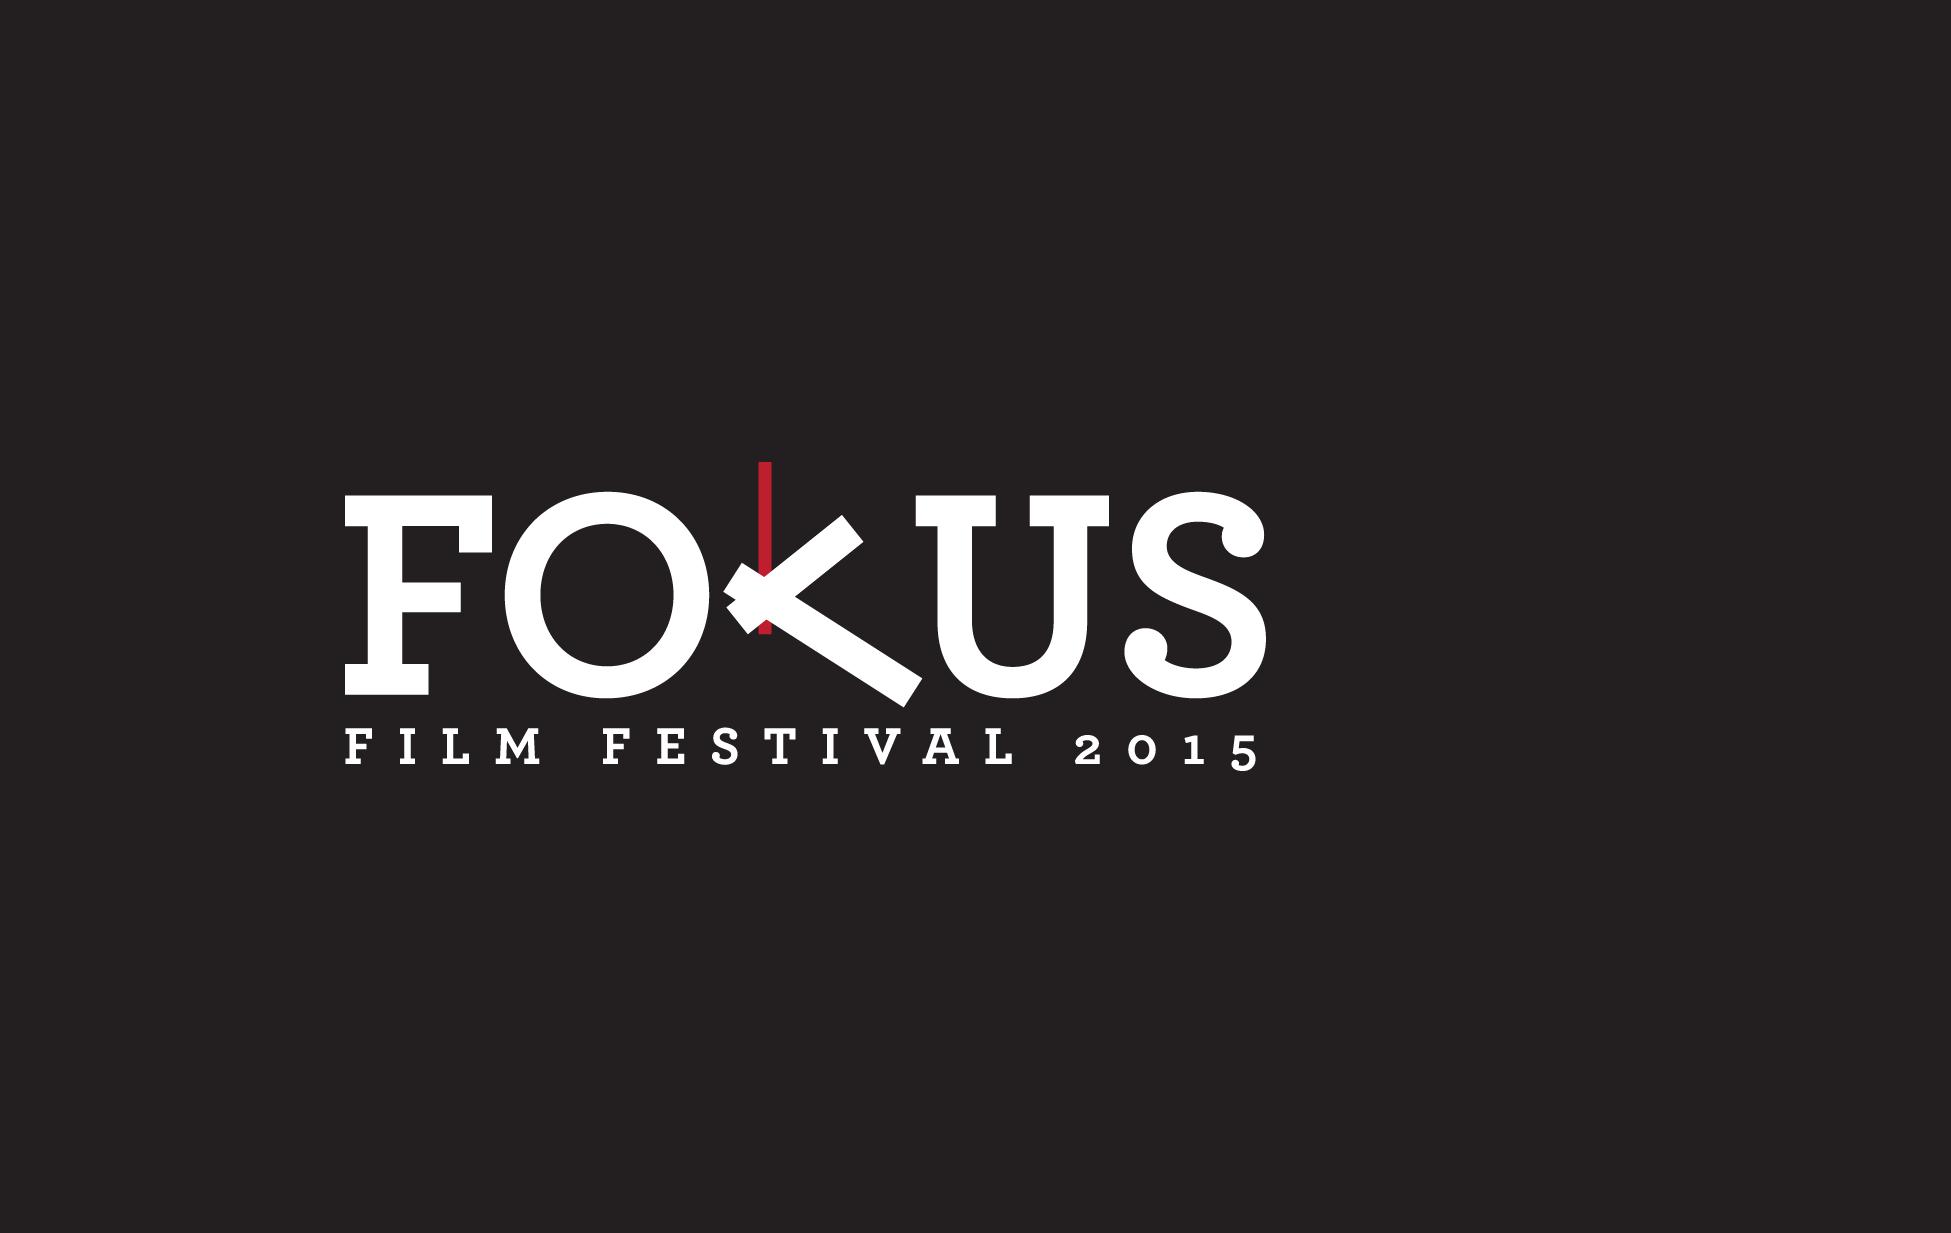 fokus film festival 2015 - LOGO DESIGN// March 2015